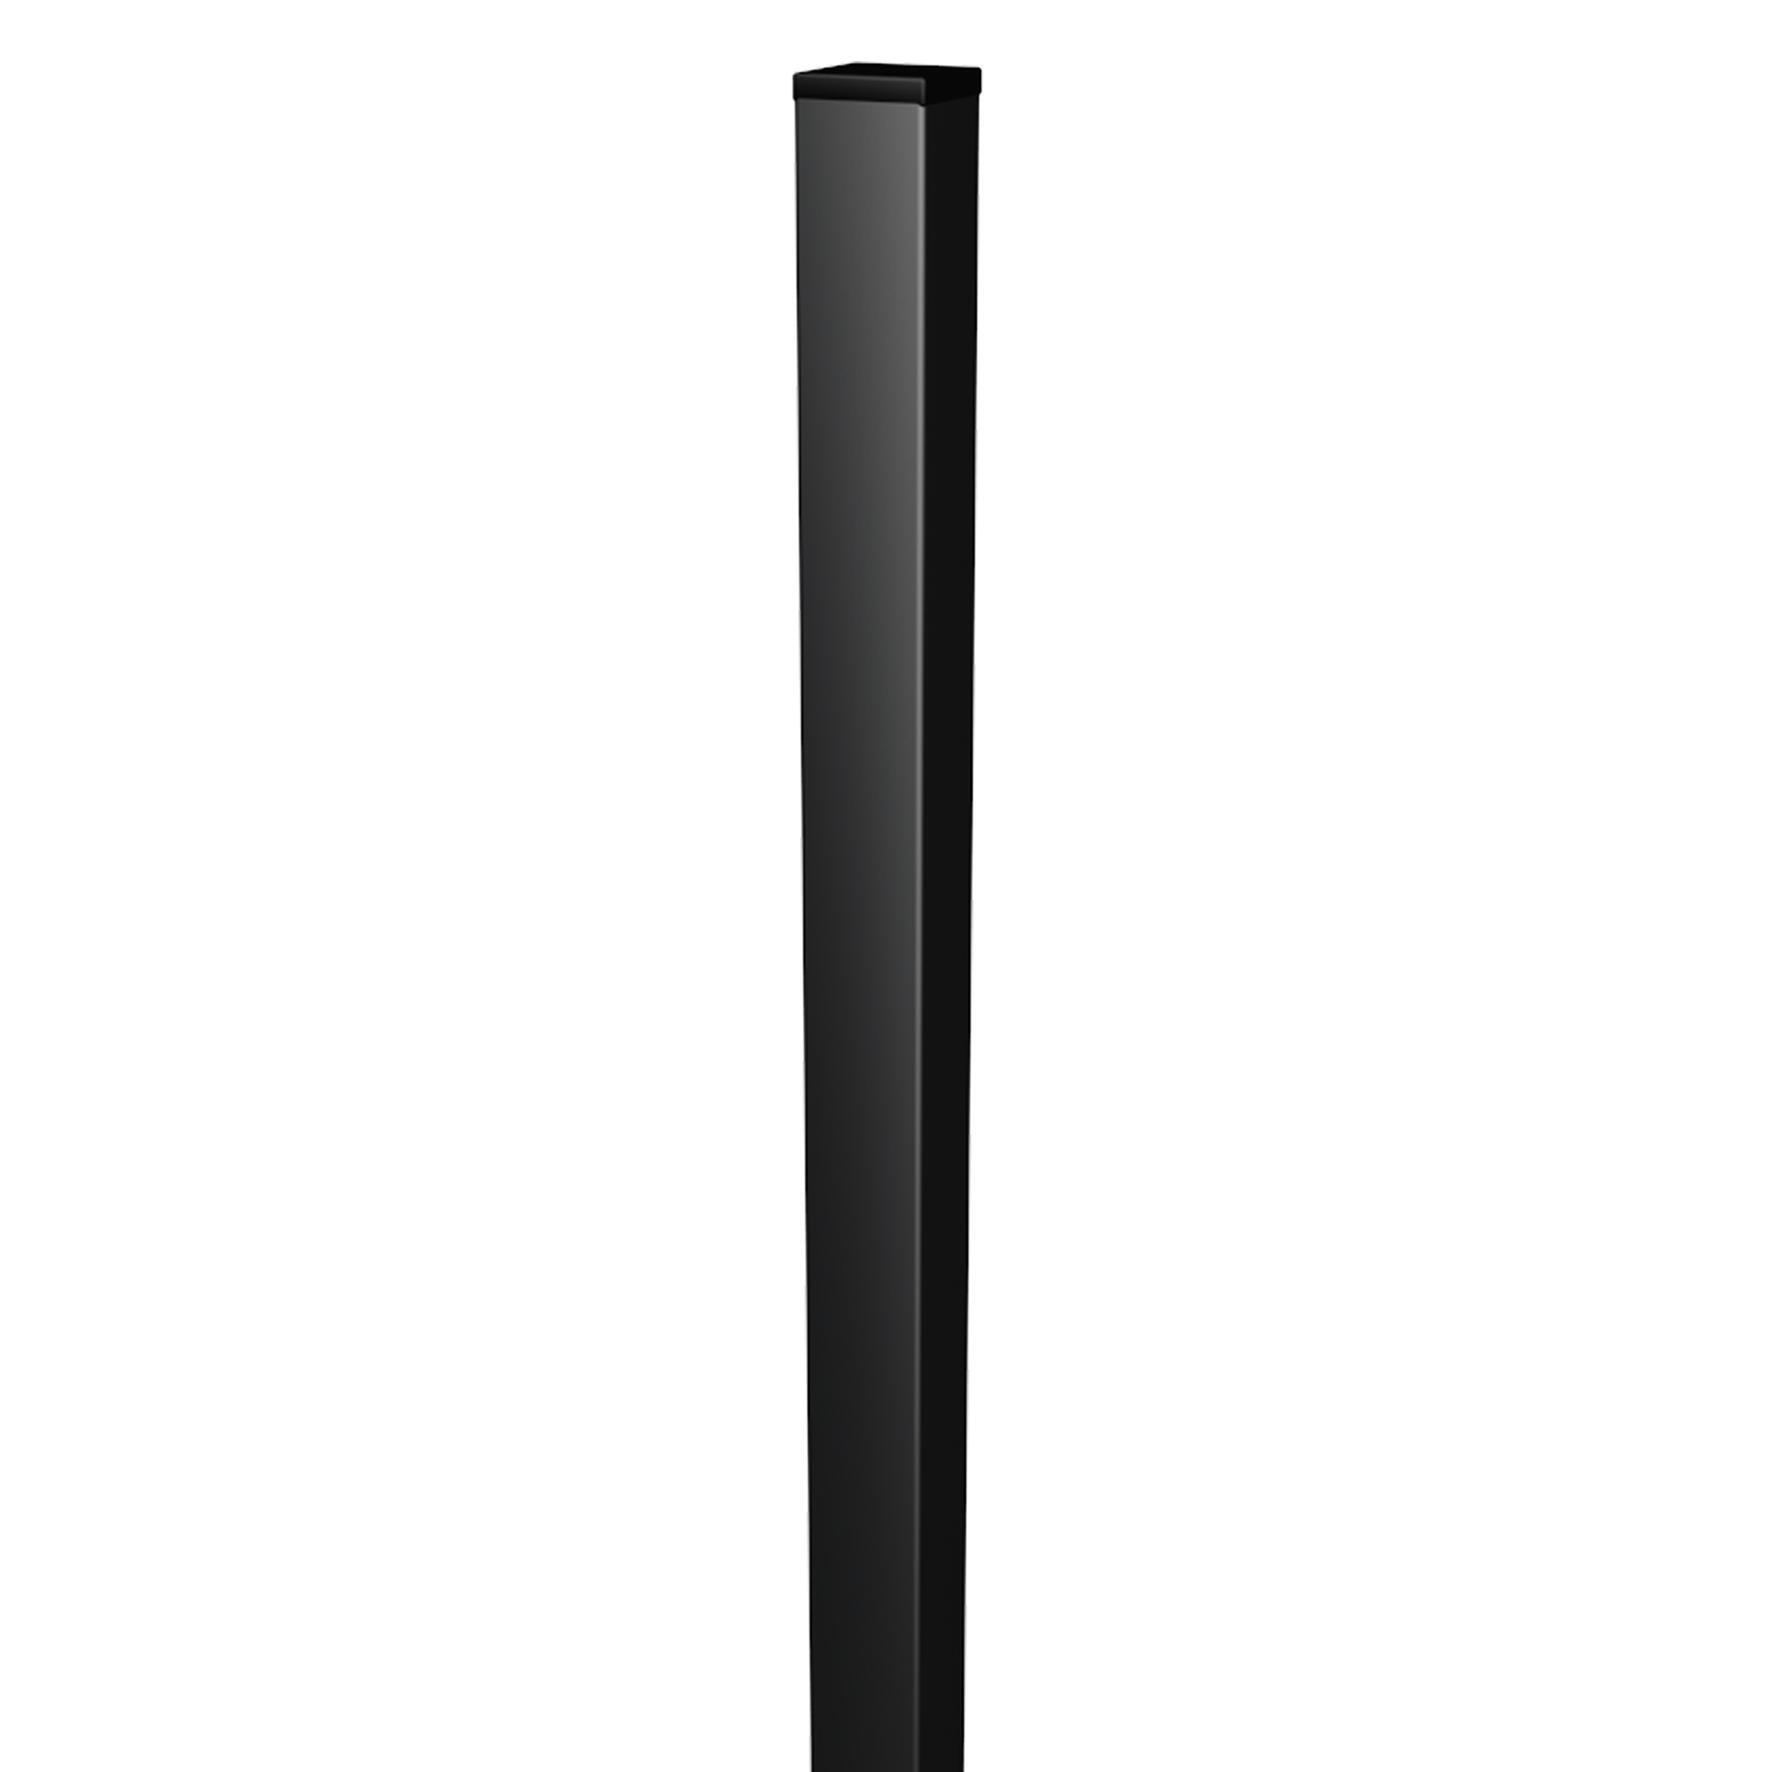 Palo in acciaio galvanizzato plastificato Medium quadrato H 110 cm L 5 x 5 cm